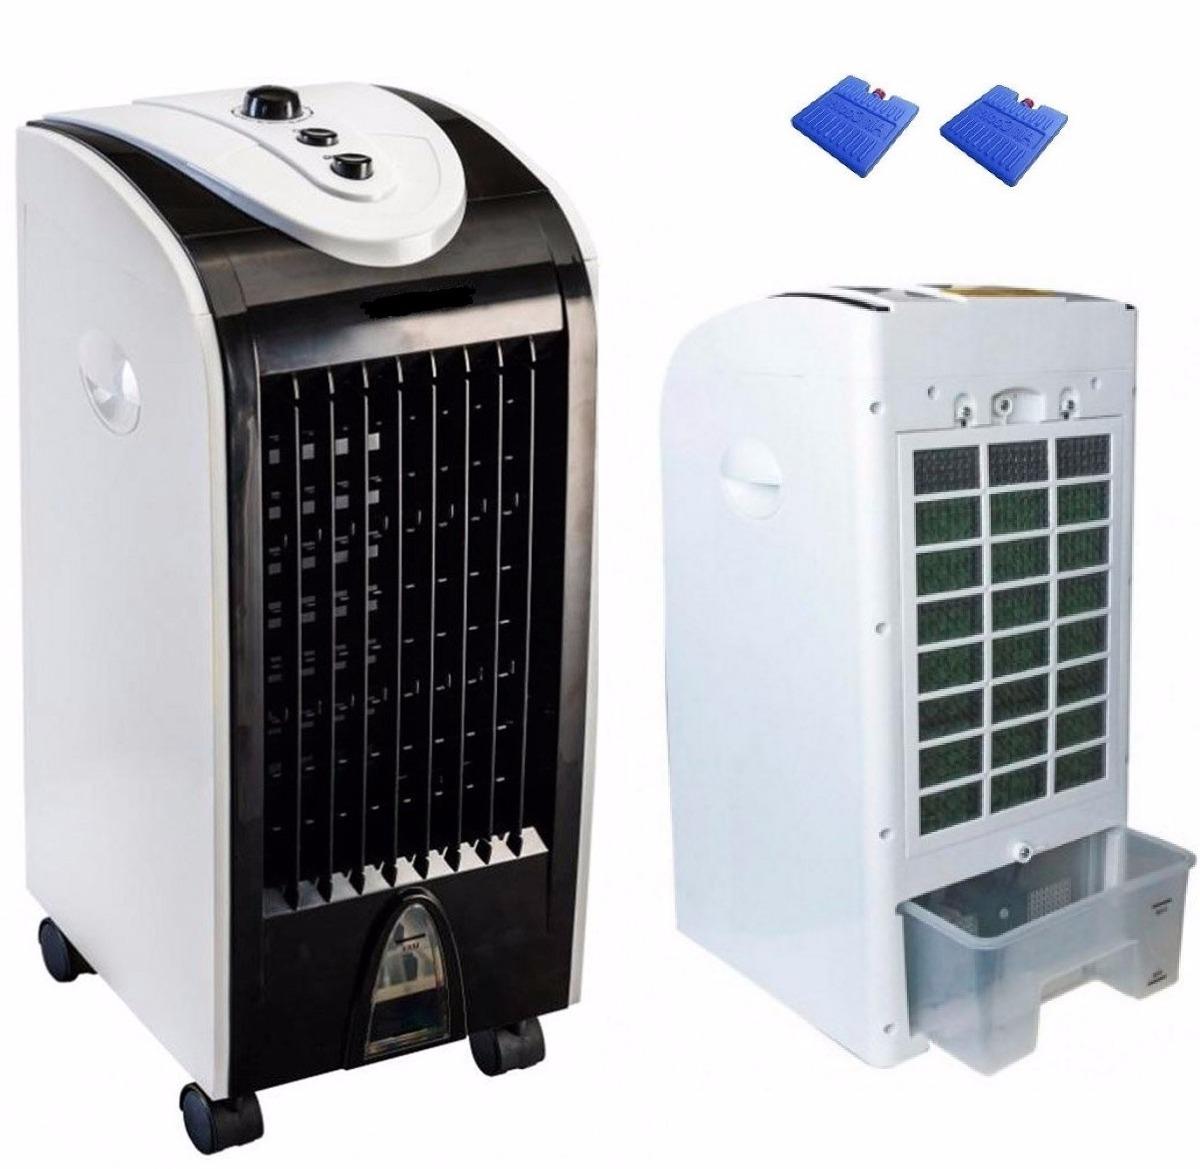 Climatizador aire fr o port til 4en1 bajo consumo 5 for Consumo aire acondicionado portatil